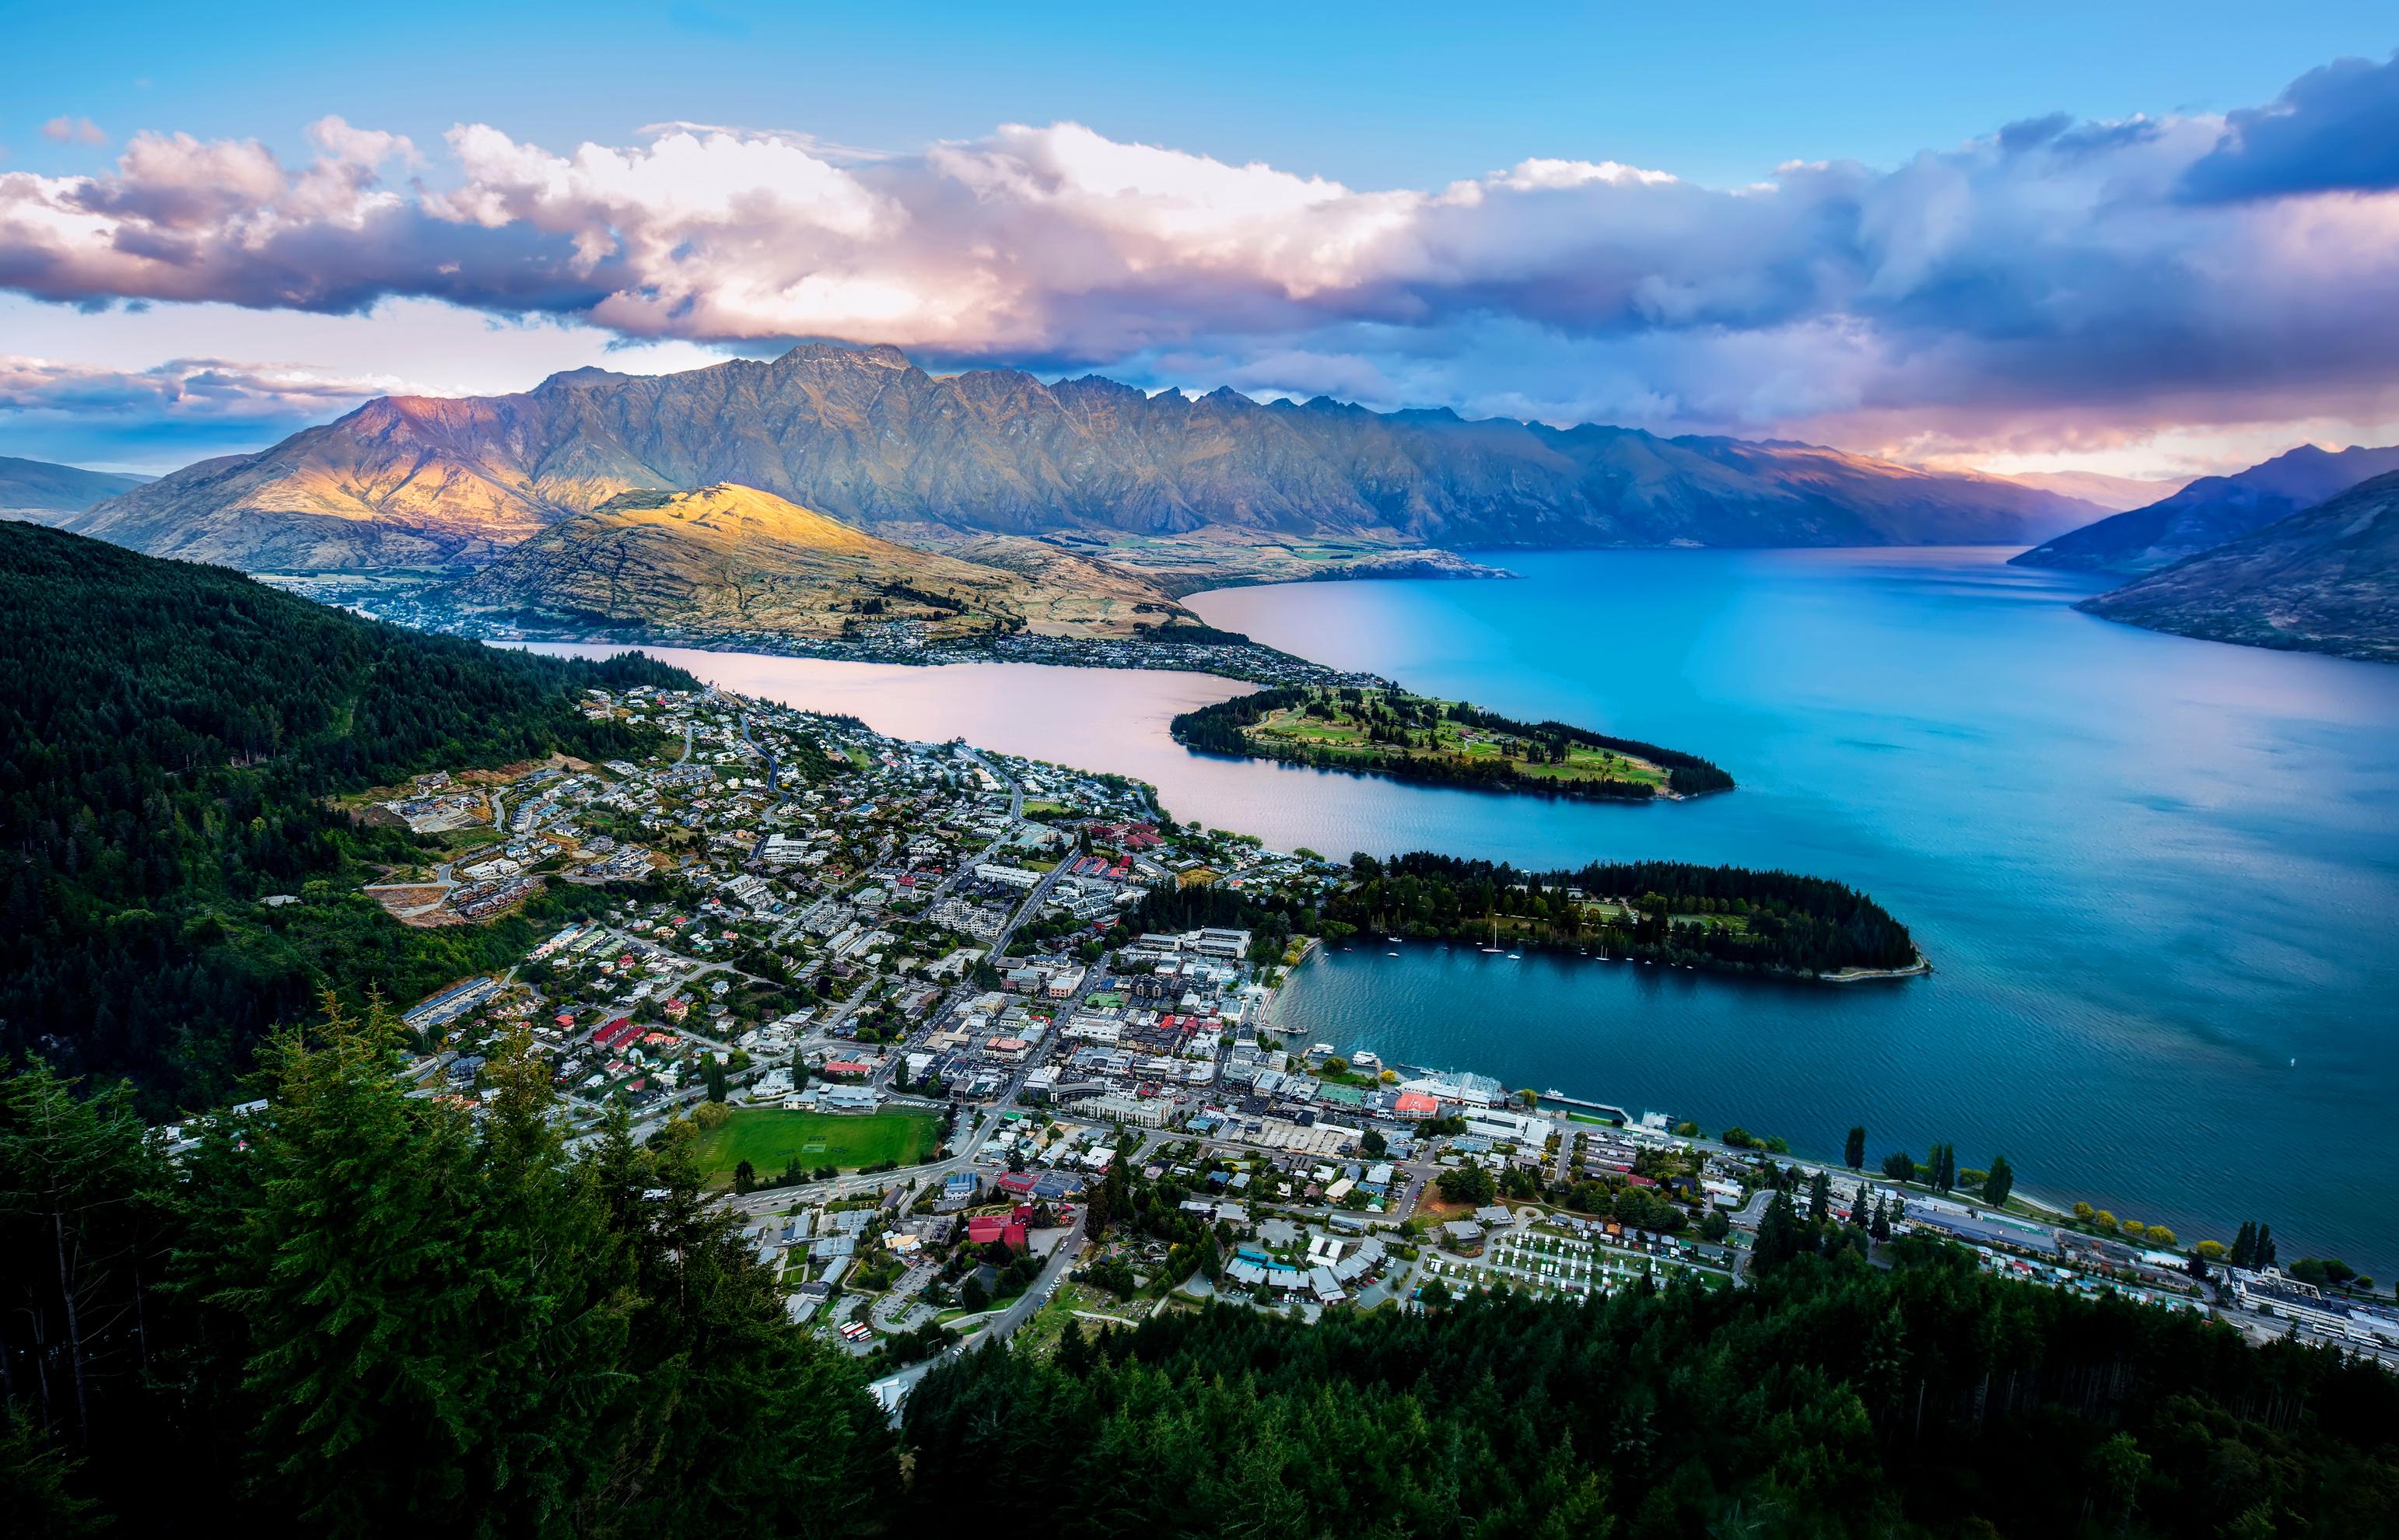 Bay of Islands, New Zealand  № 624977 загрузить